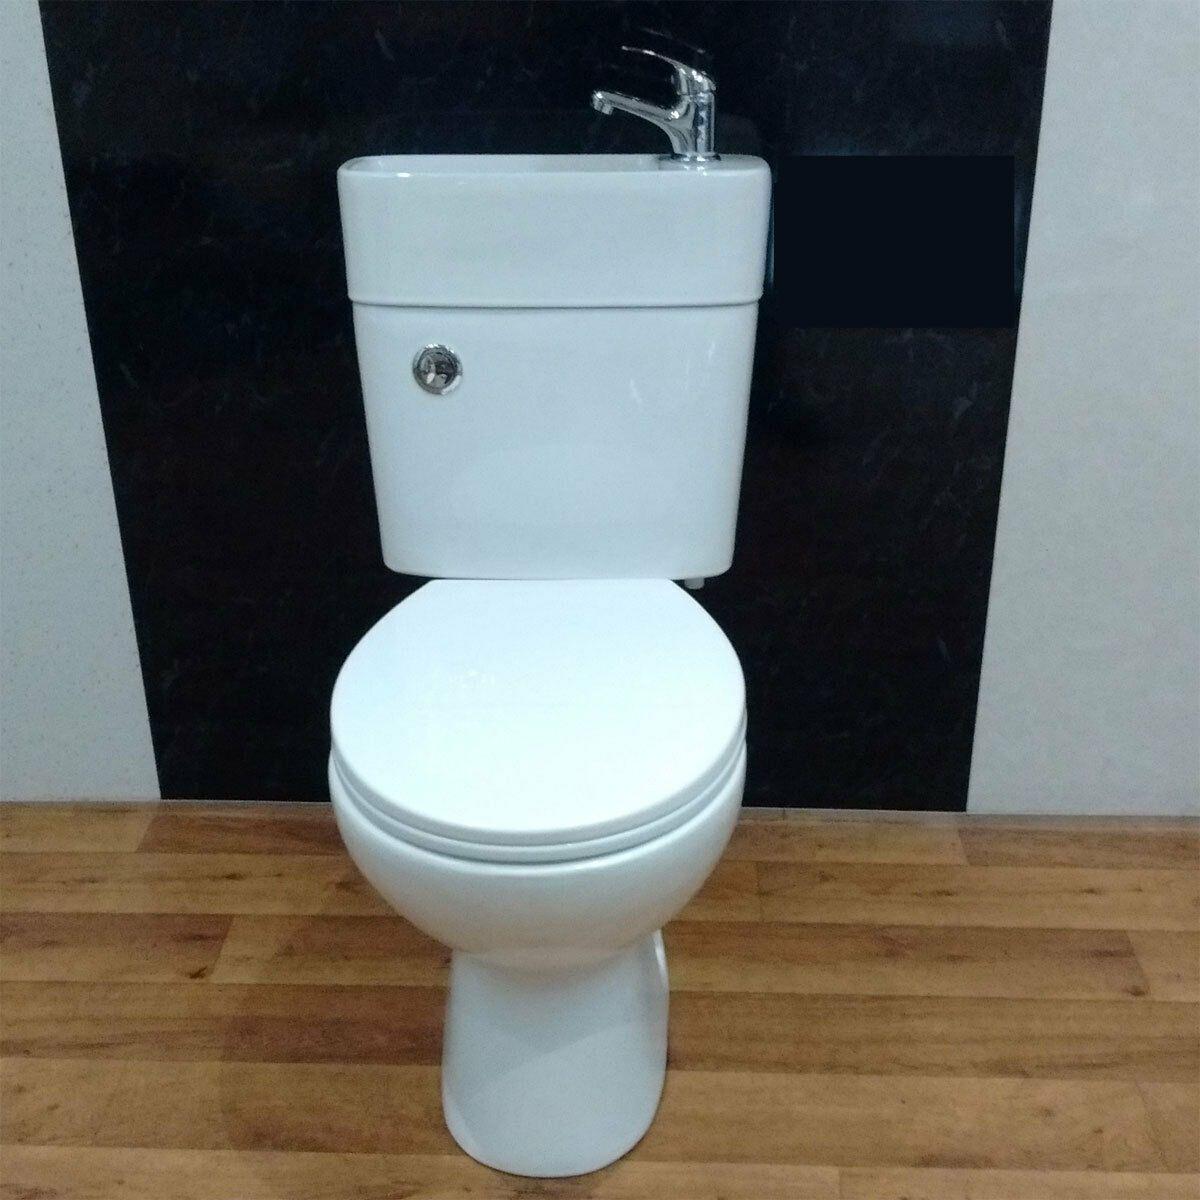 Toilet Bidet Combination in 2020 Bidet, Basin, Toilet